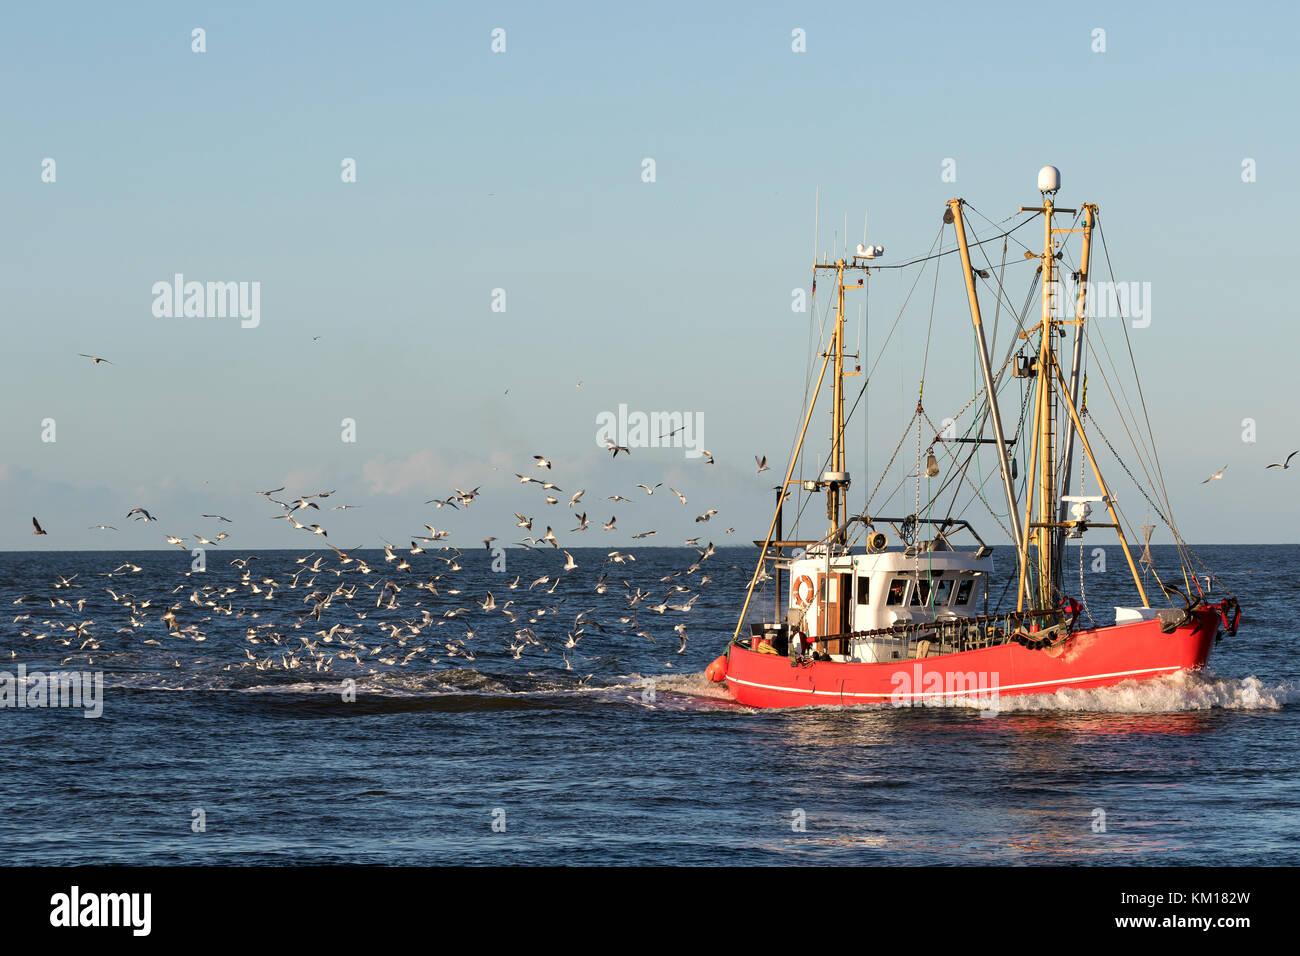 fishing vessel at sea - Stock Image